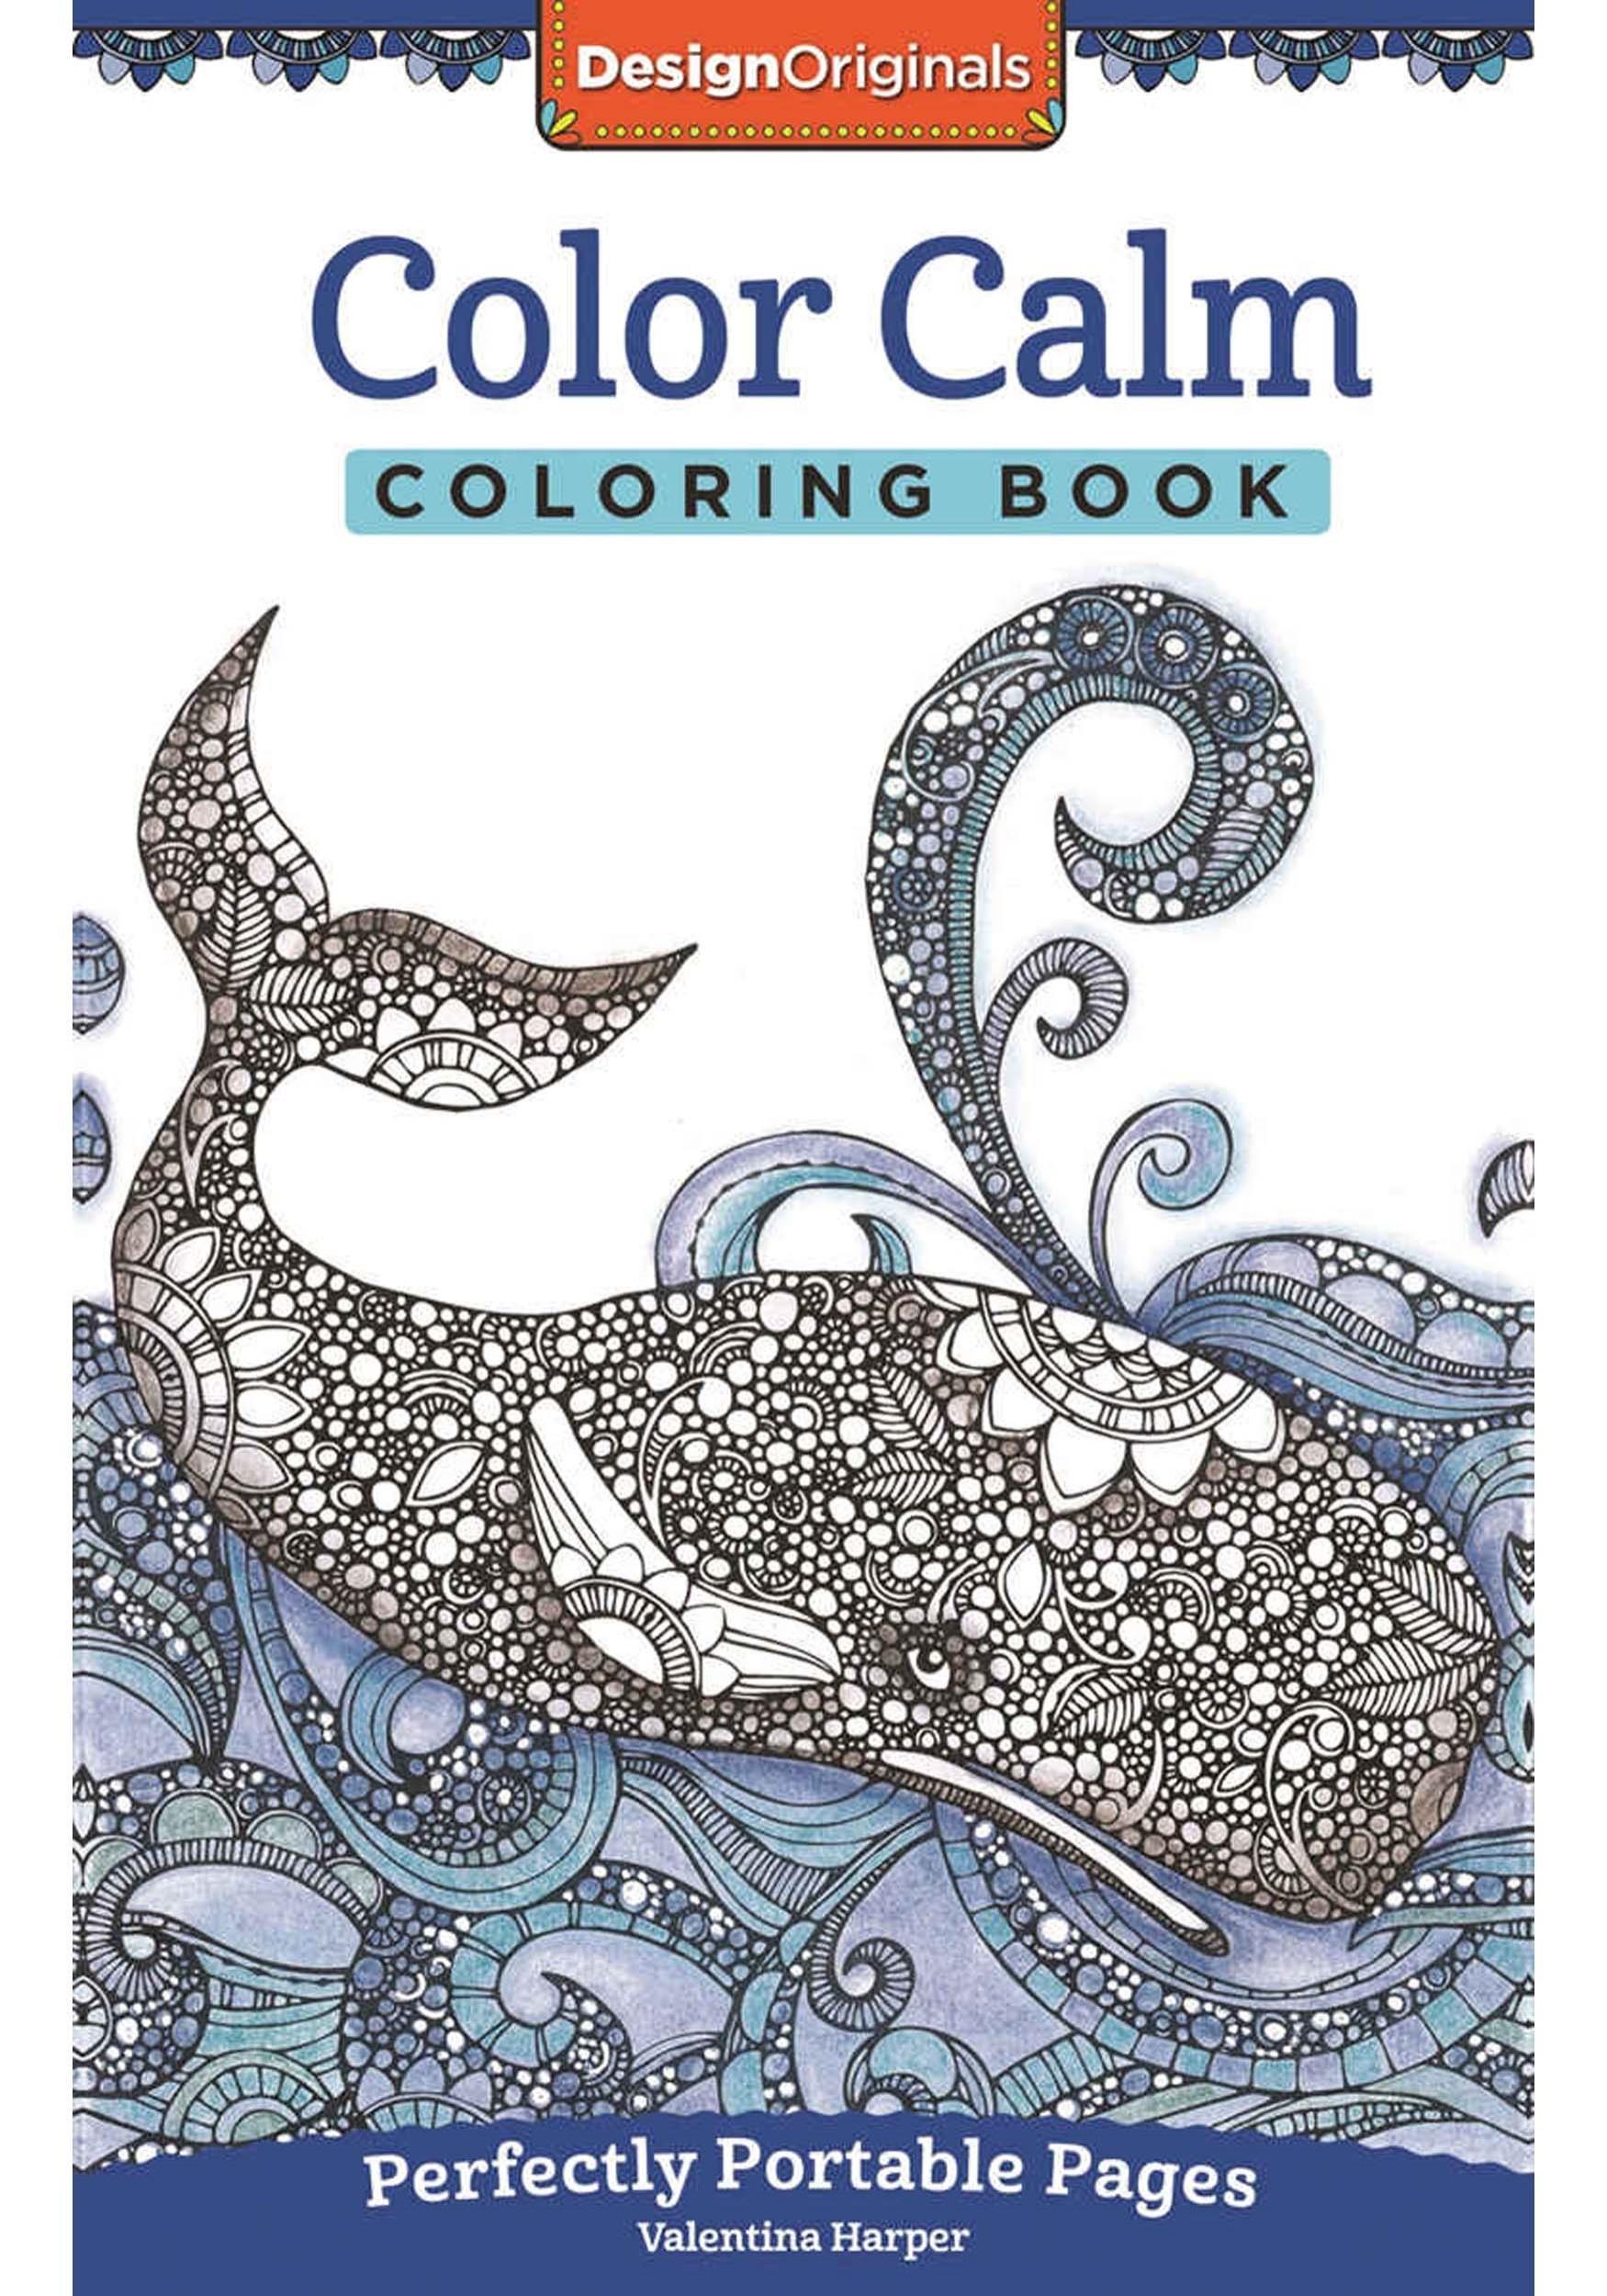 Color Calm Coloring Book